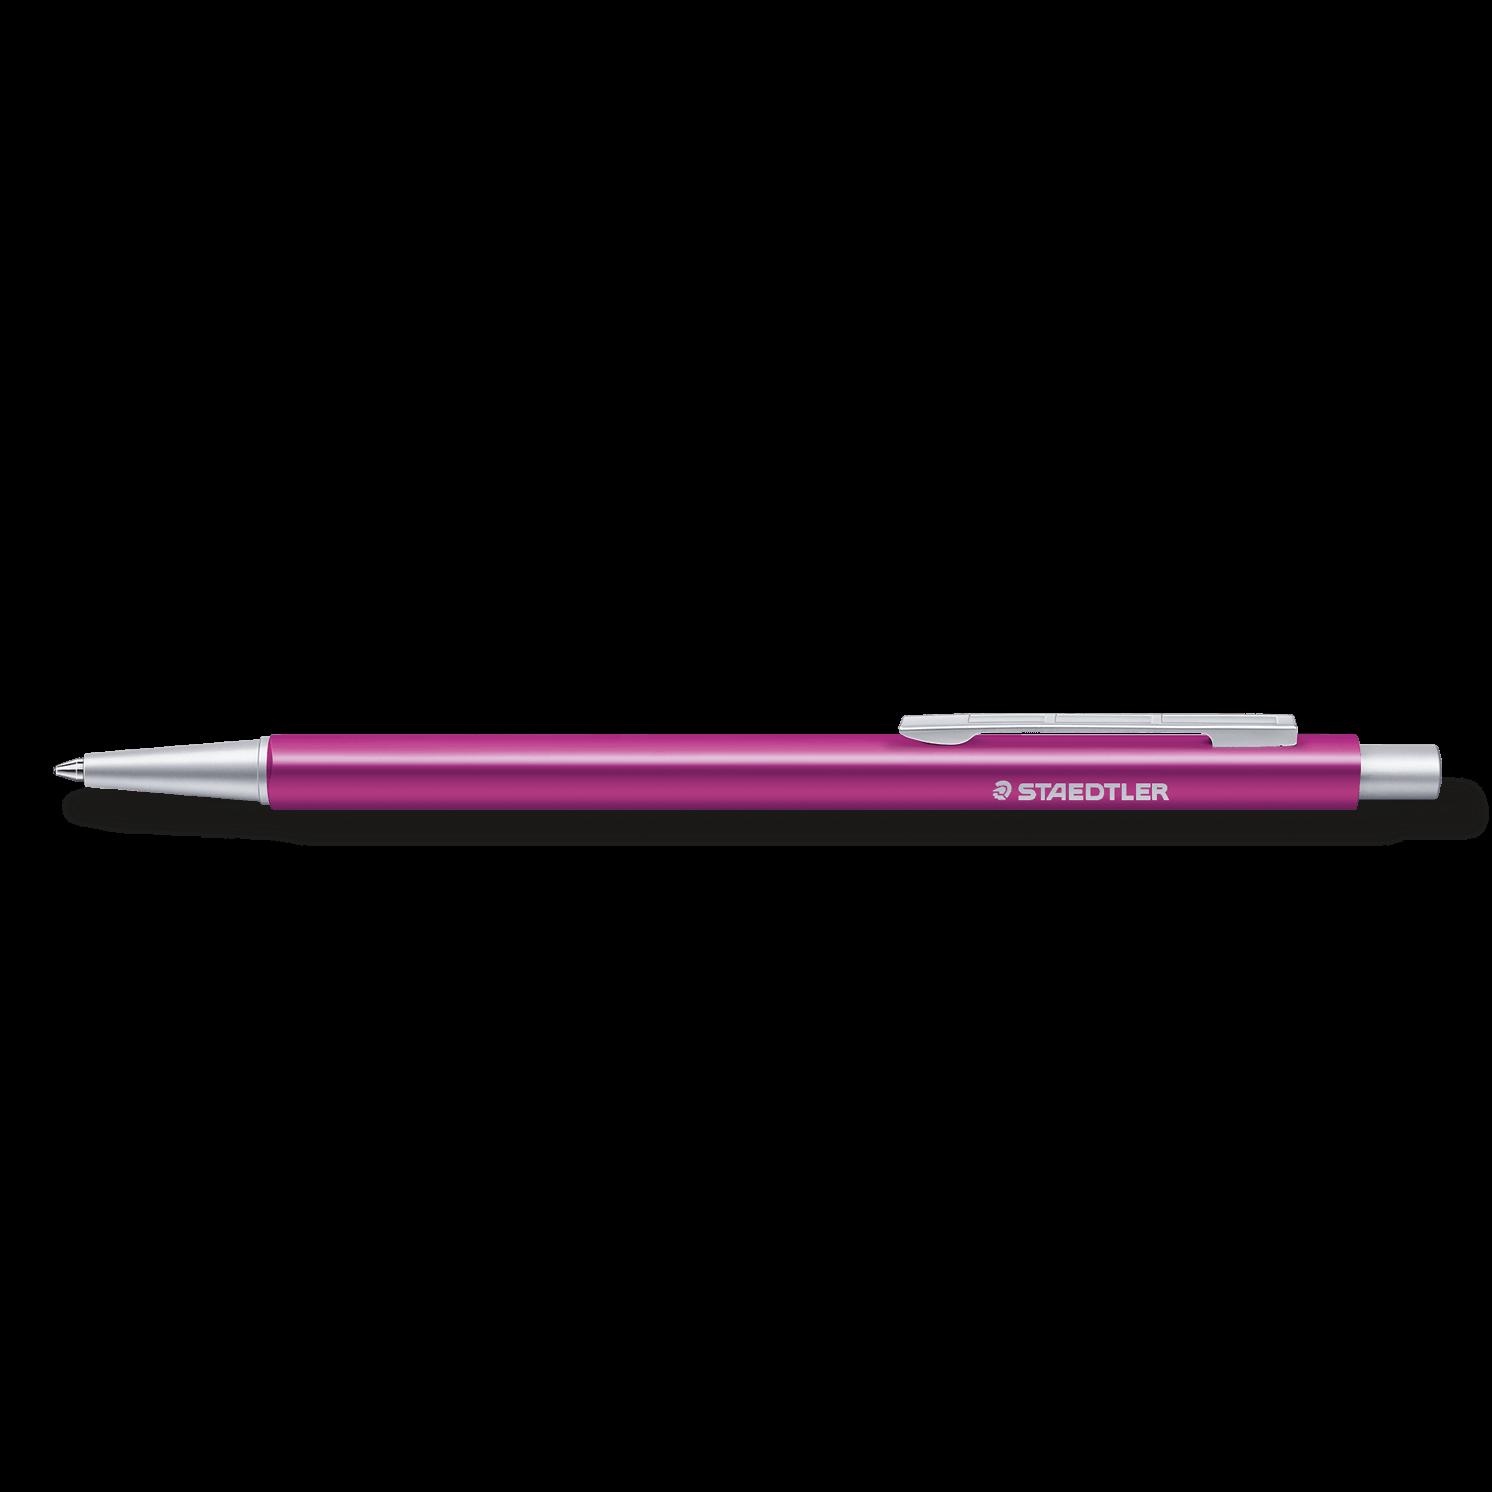 Organizer Pen Ballpoint Pen Organizer Pen Staedtler